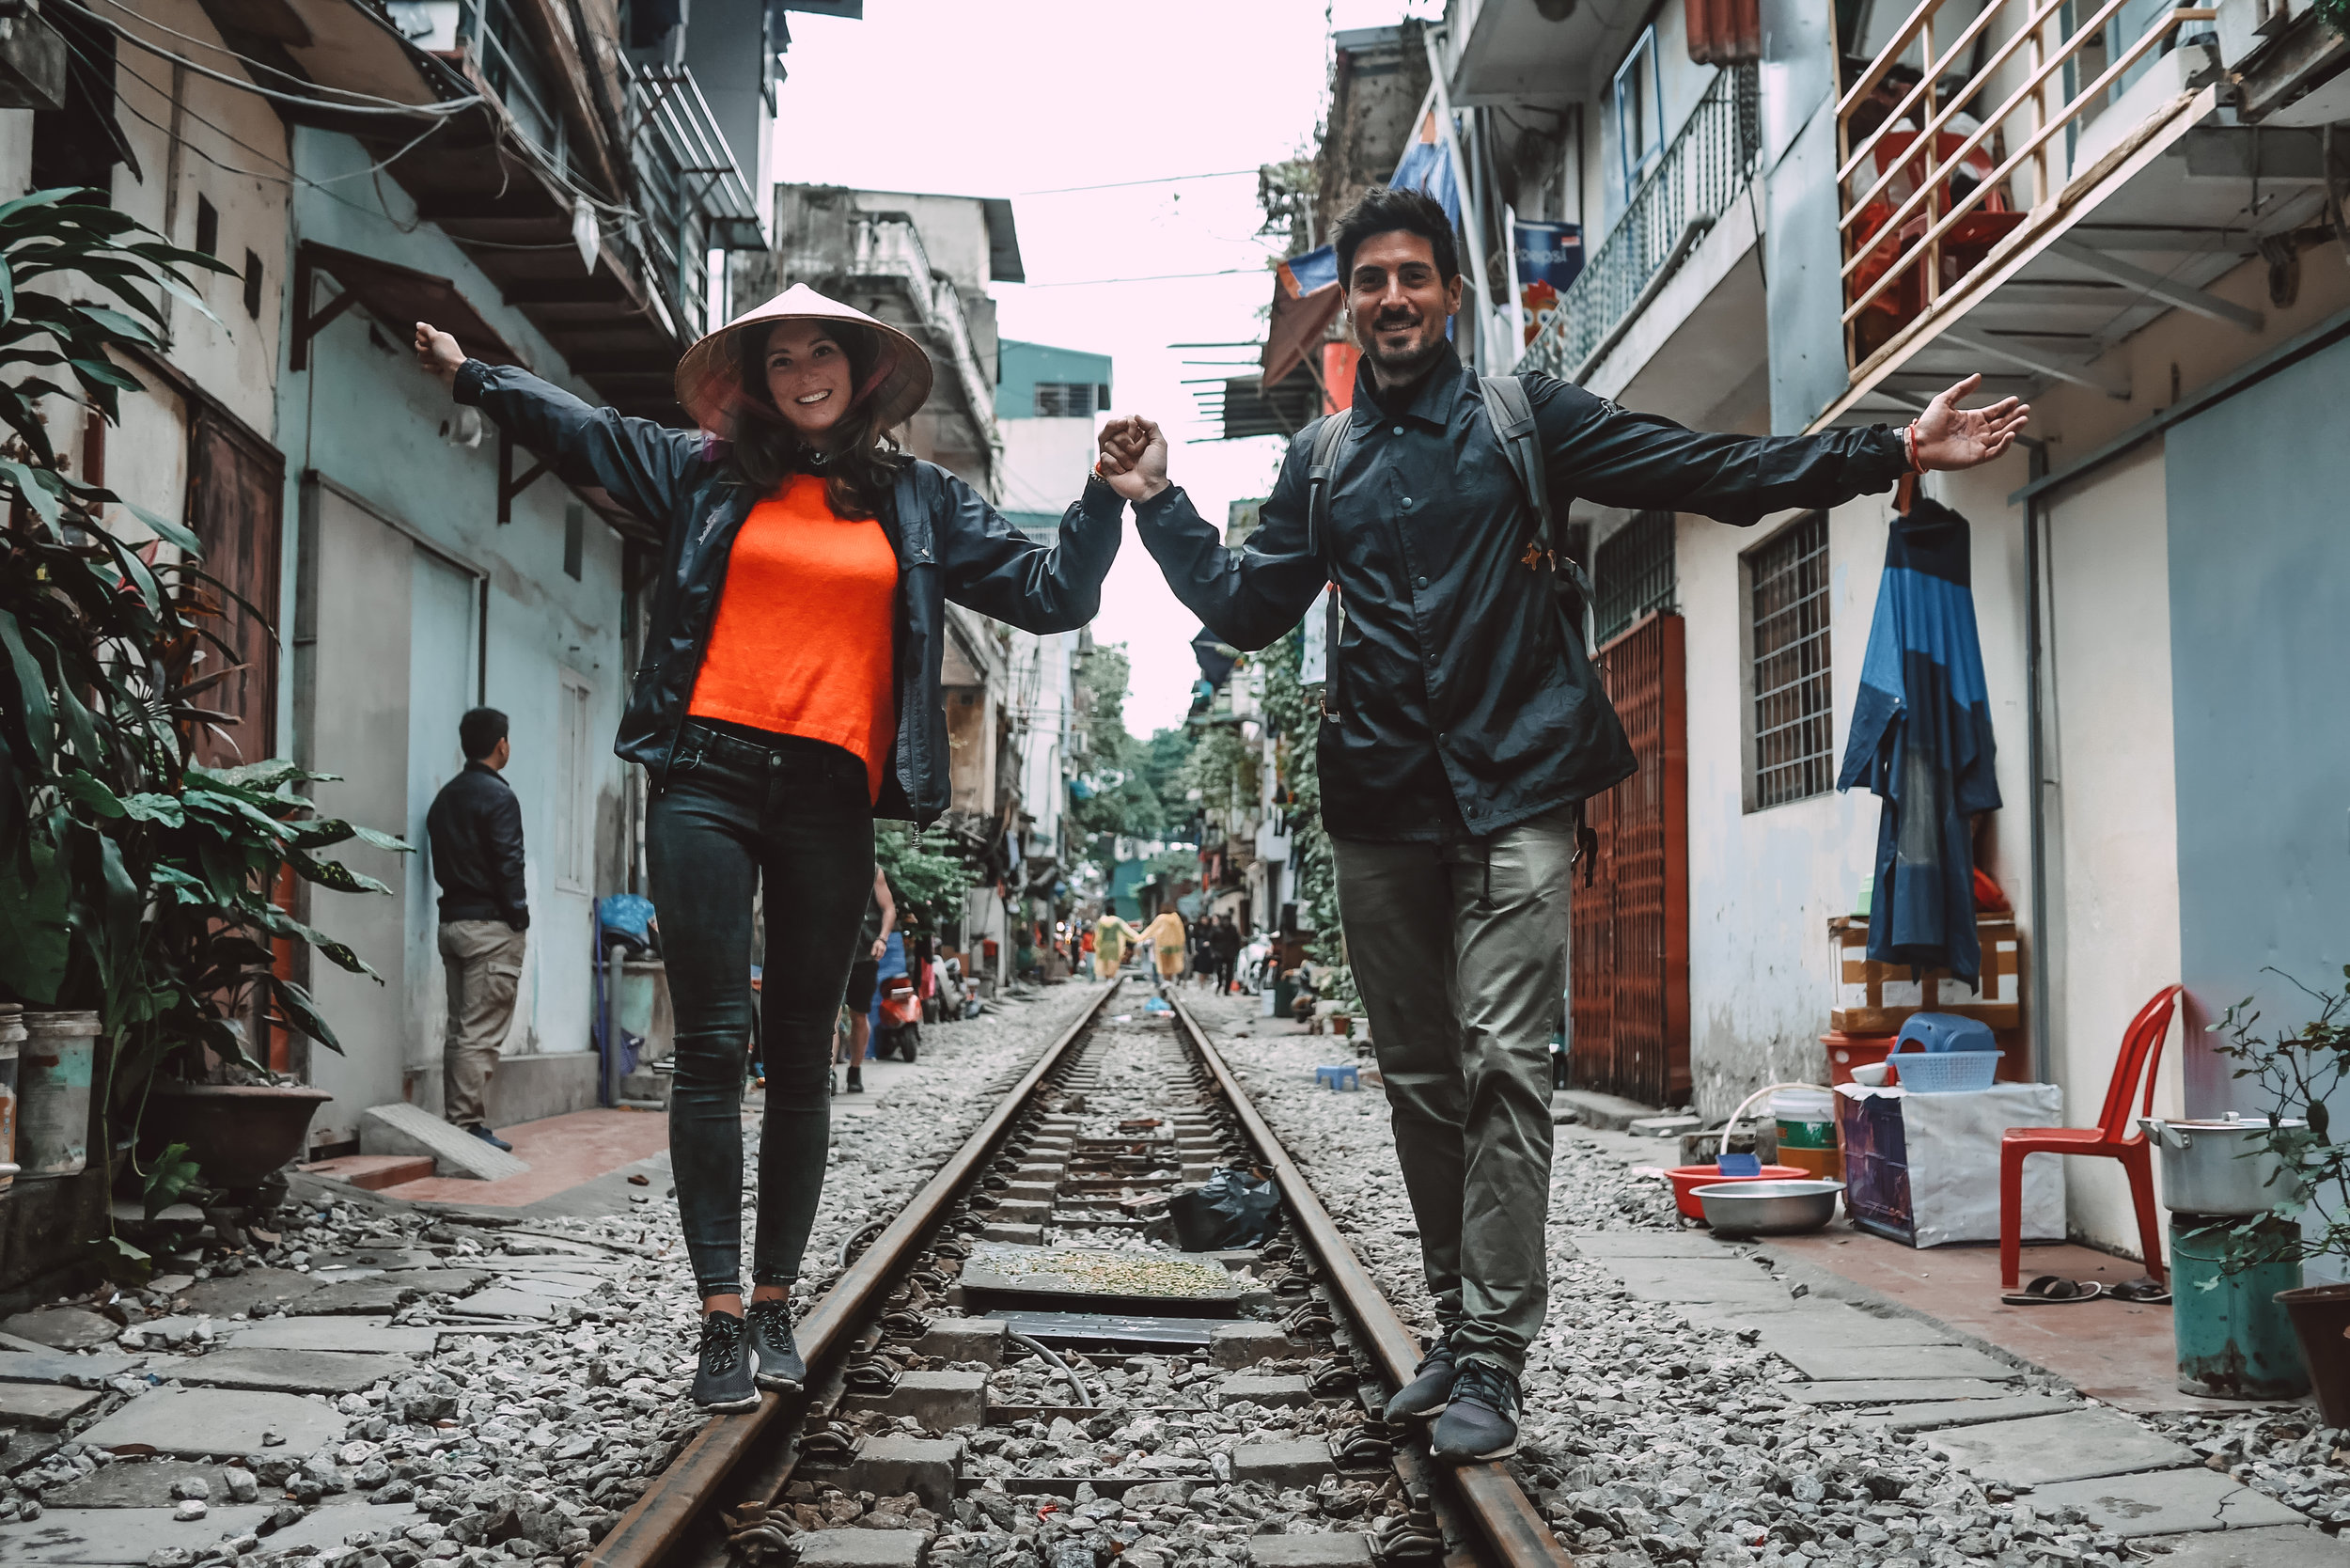 hanoi-les-tips-vietnam-the-cheerfulist.jpg